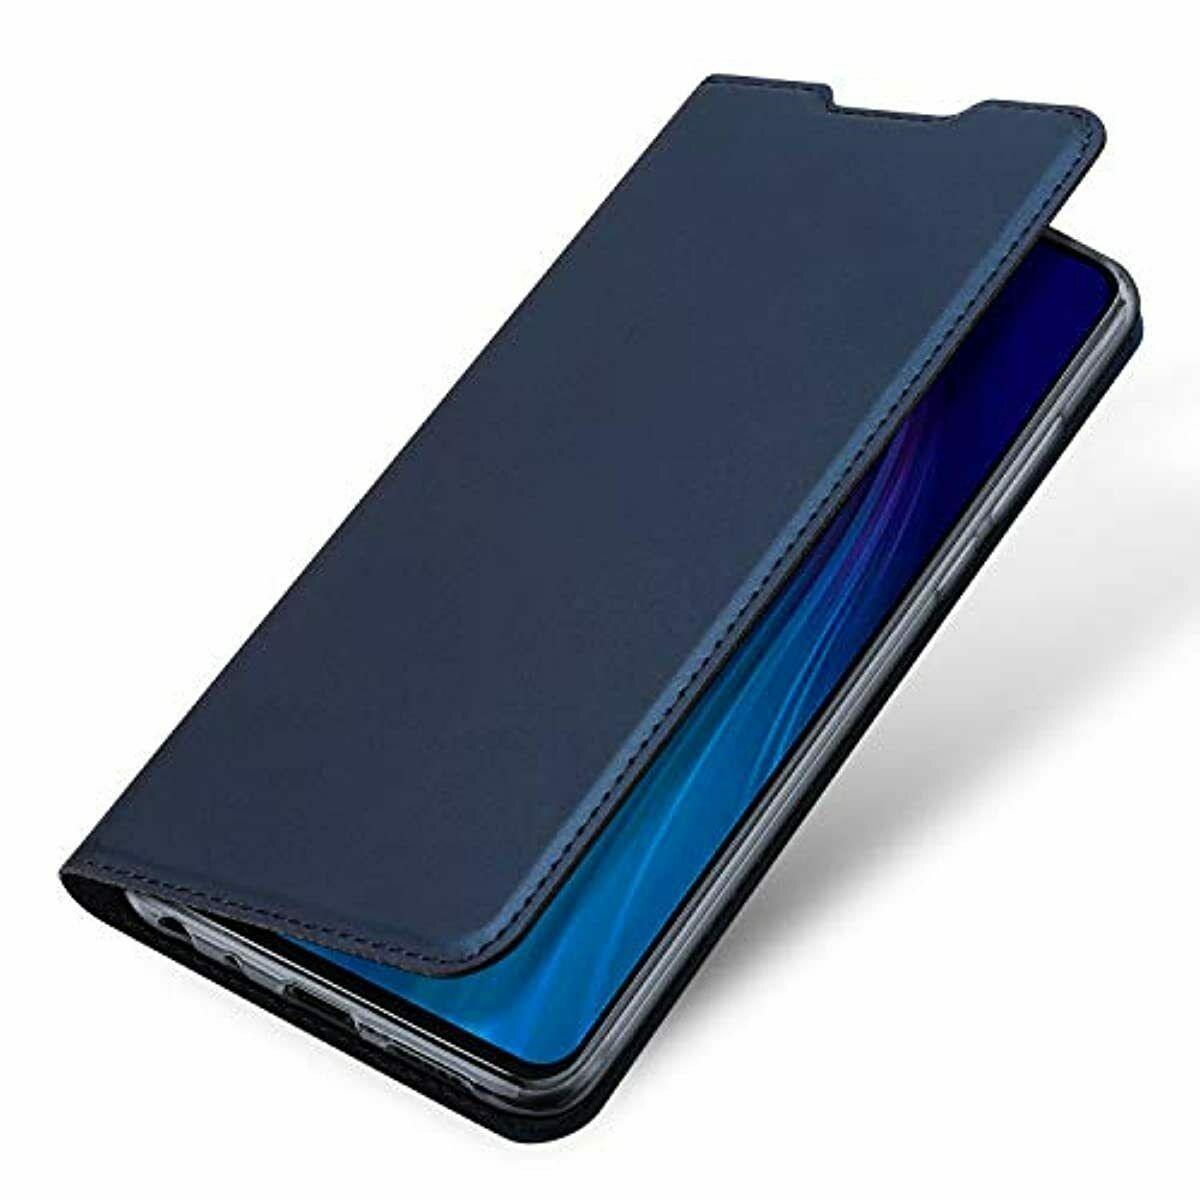 Dux Ducis Xiaomi Redmi Note 8T Skin Pro Series Case Blue Чехол-Книжка